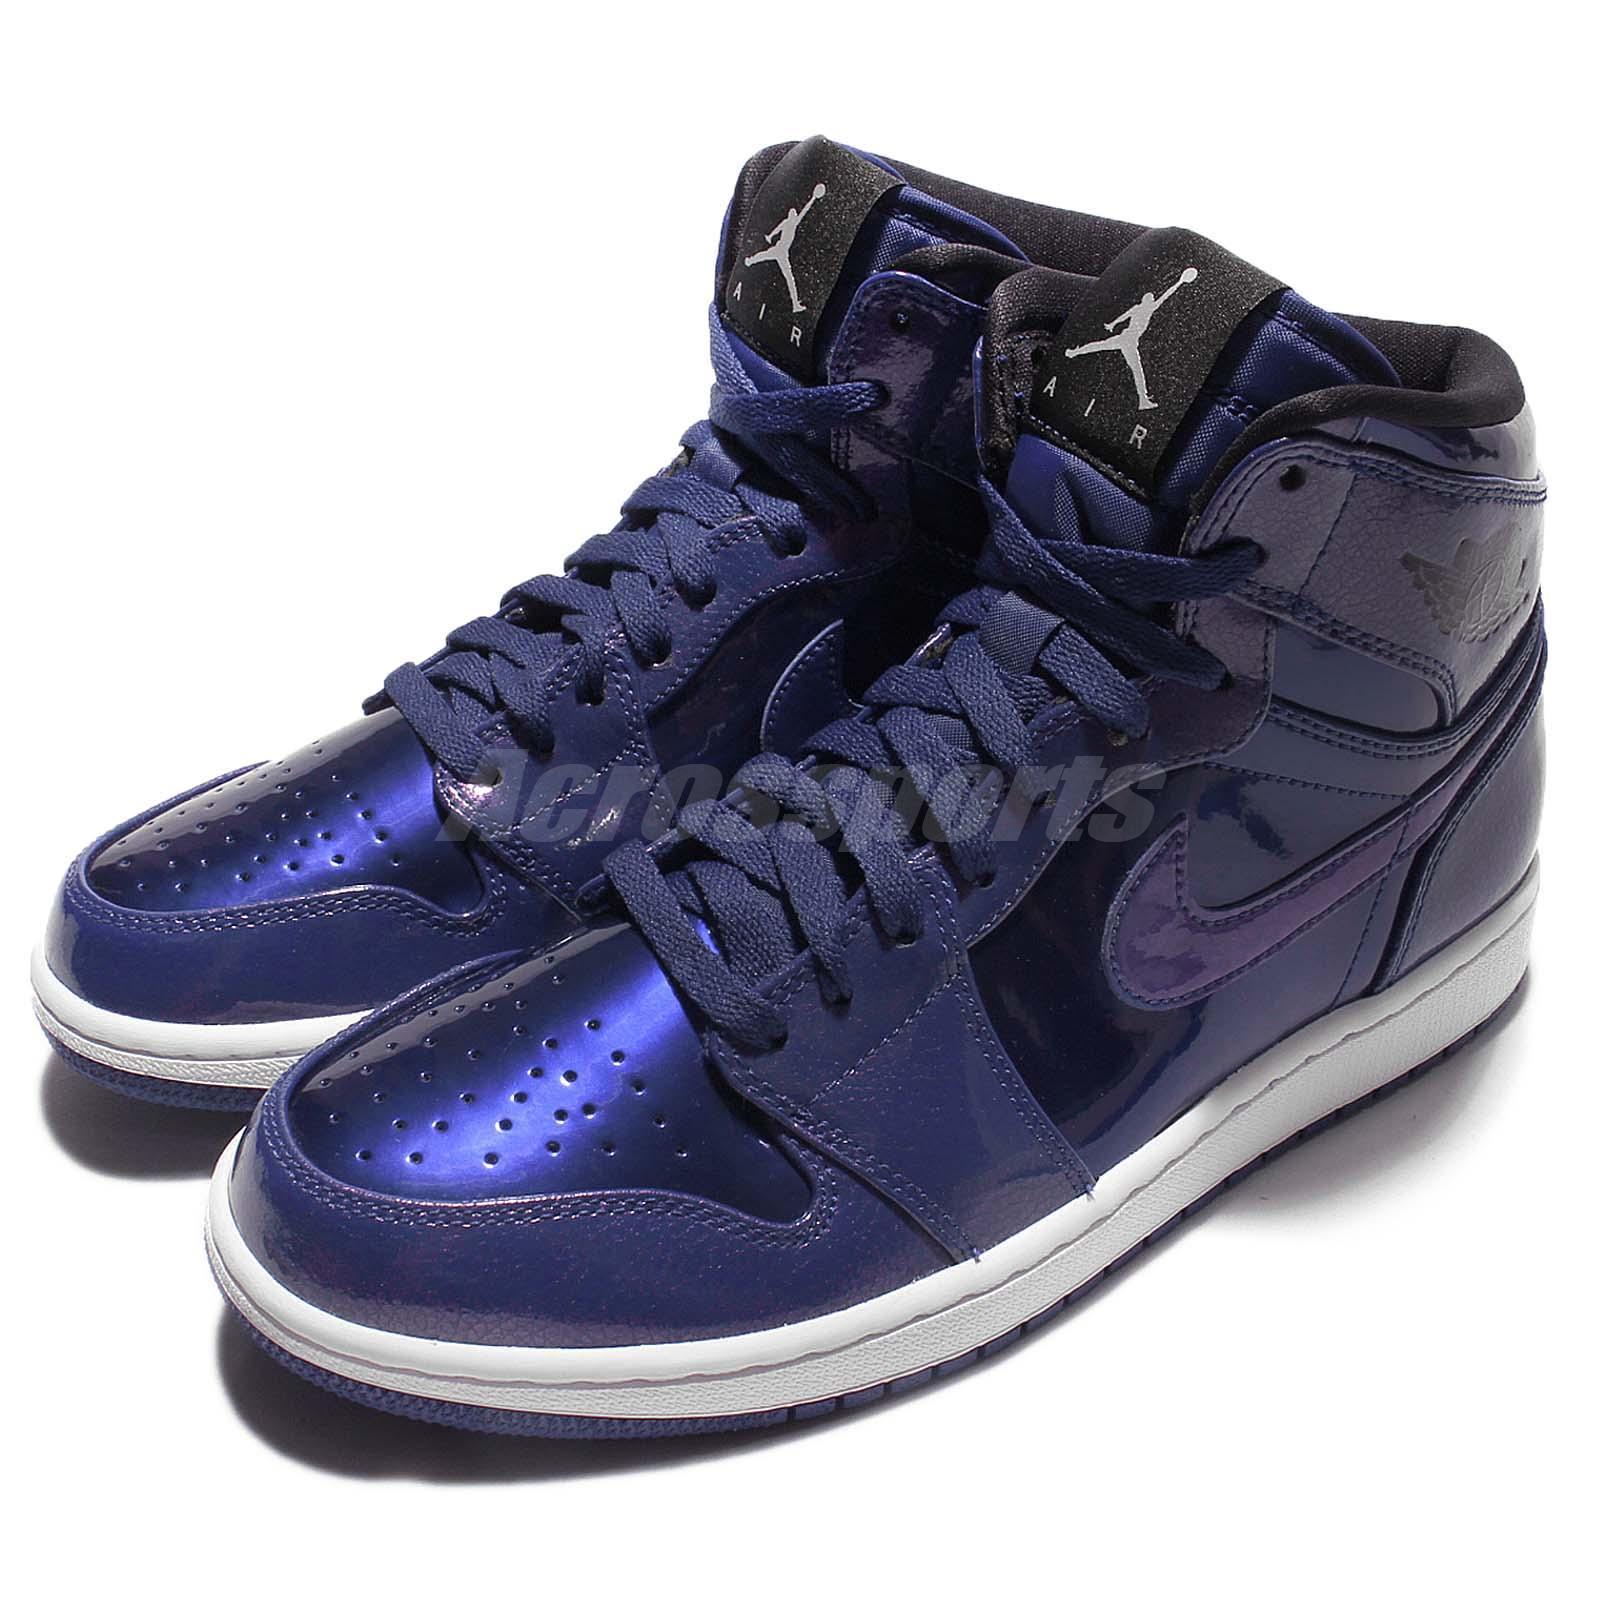 Jordan Basketball Shoes Size